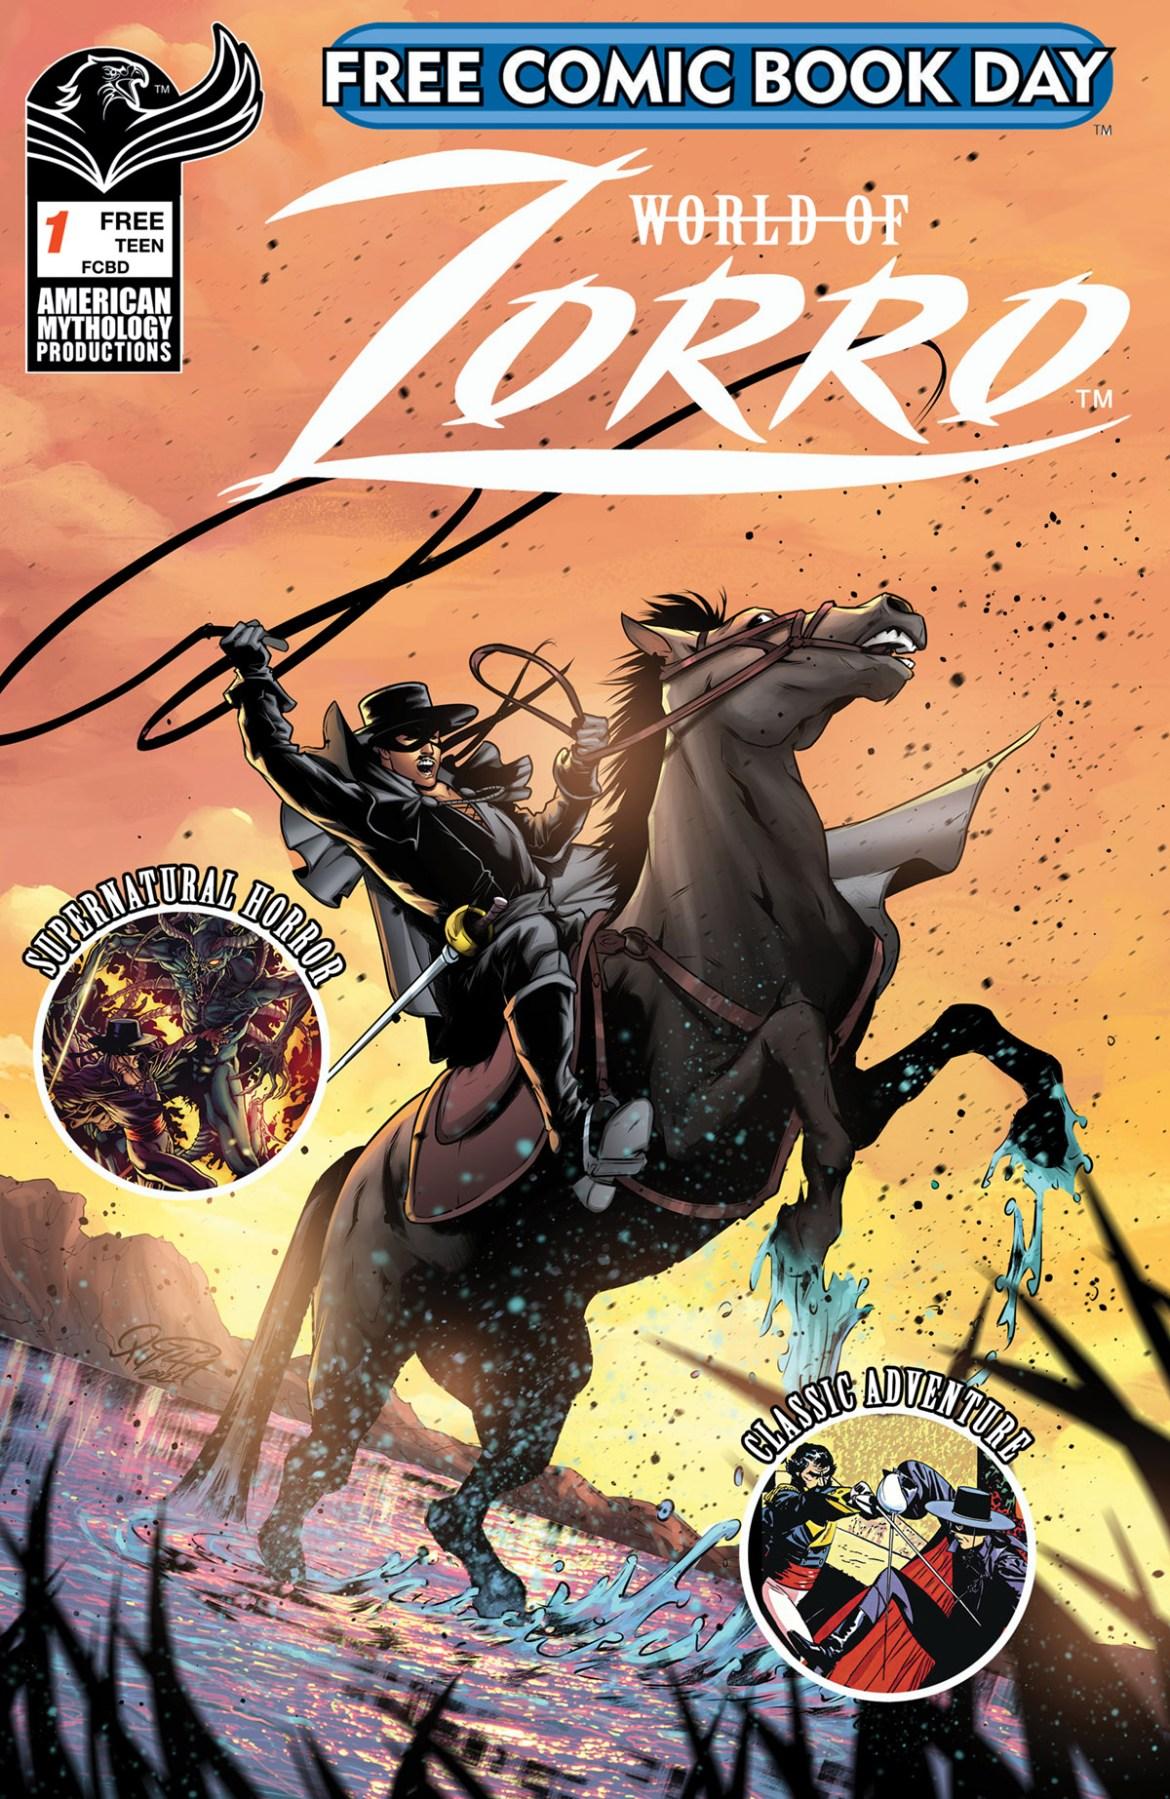 FCBD21_SILVER_American-Myth_Worlds-Of-Zorro Complete Free Comic Book Day 2021 comic book line-up announced